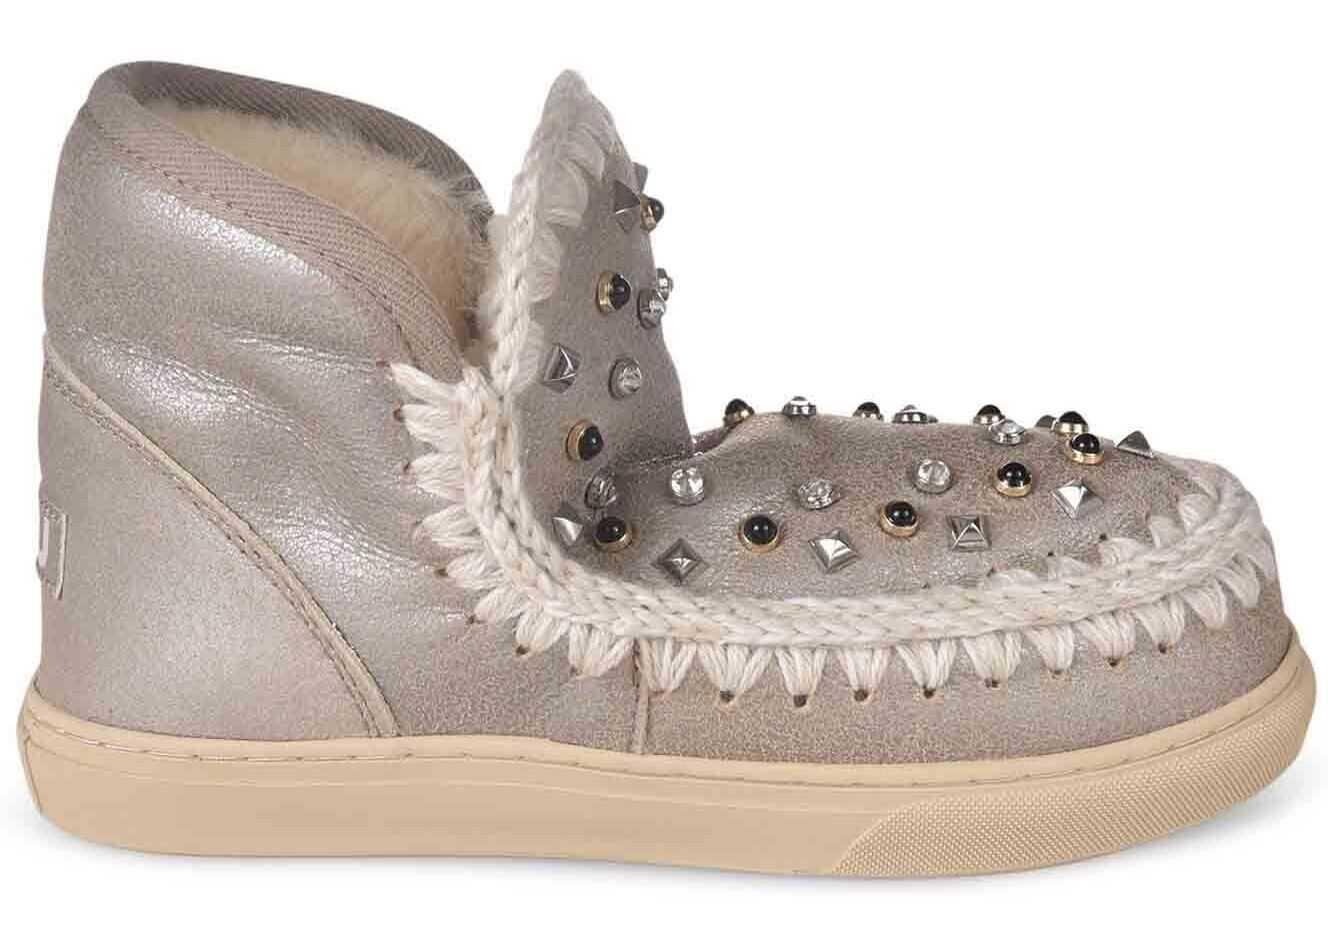 Mou Eskimo Sneakers With Studs In Beige MU.FW111023B STME Beige imagine b-mall.ro